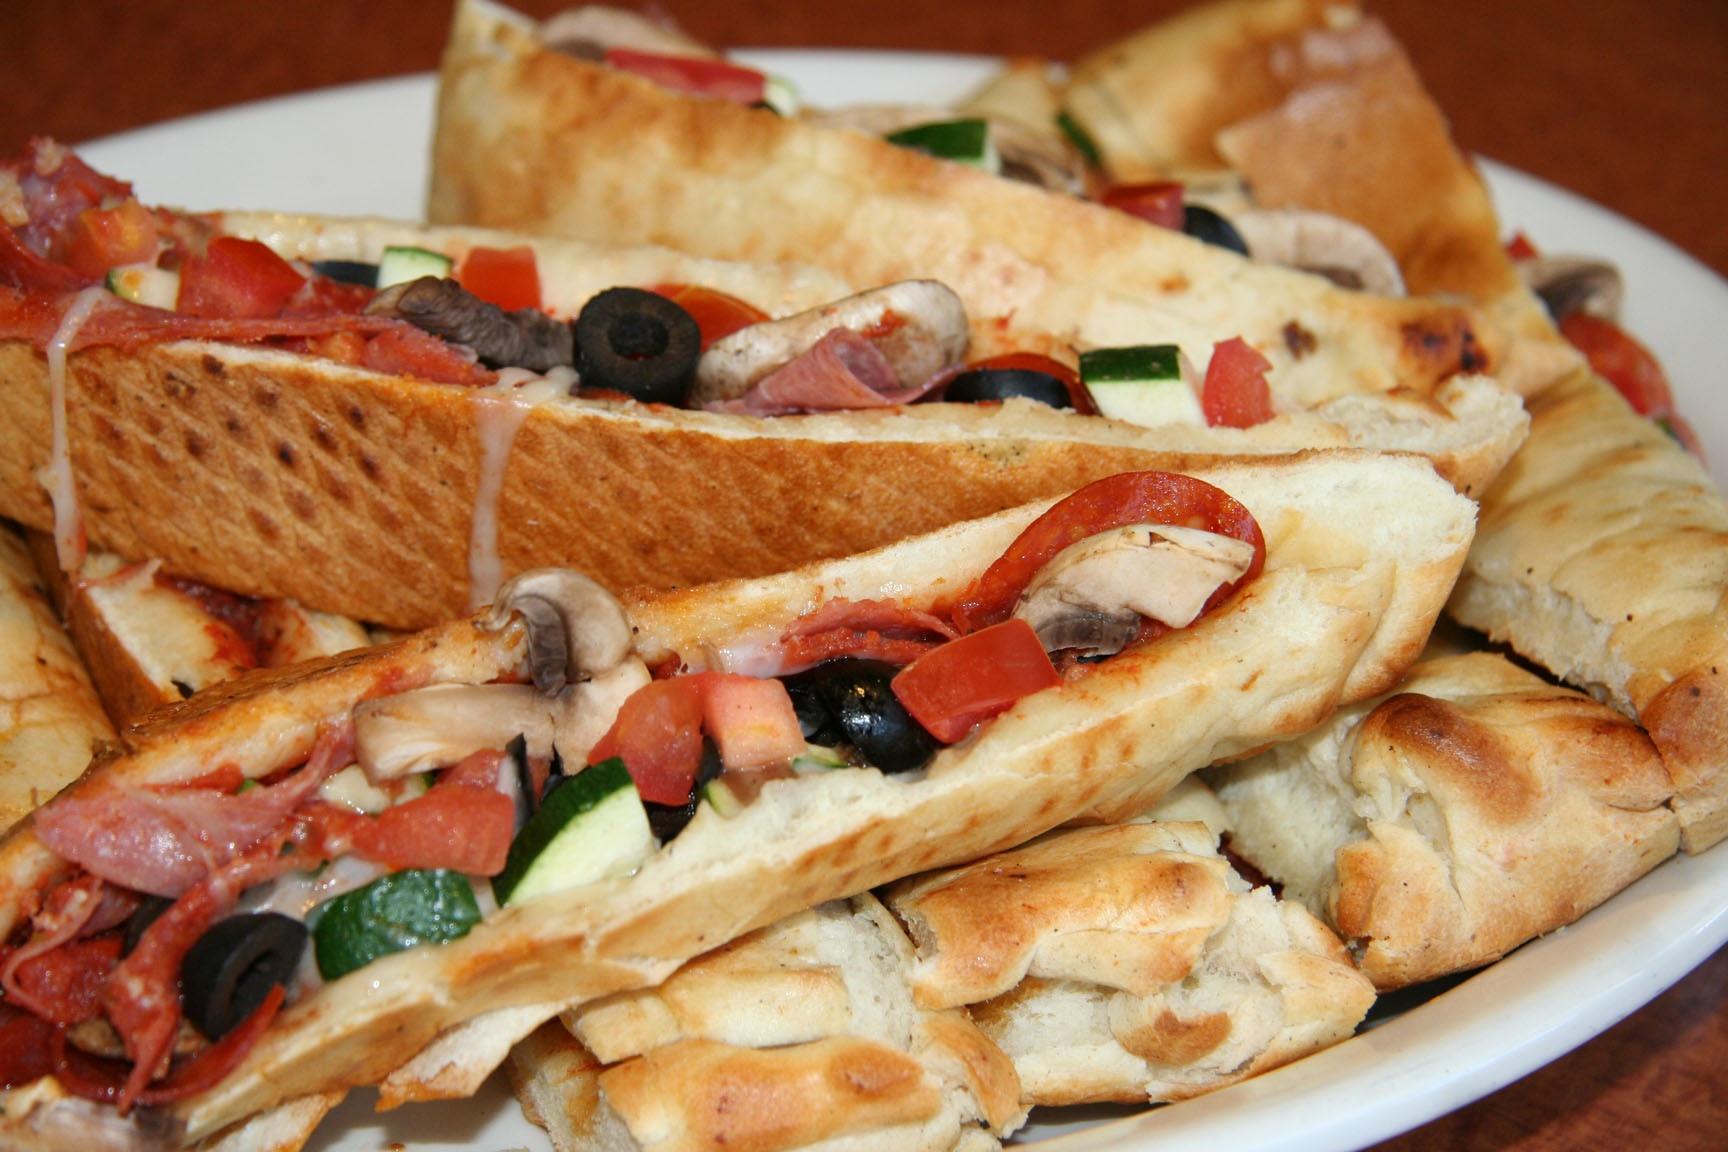 Stuffed-Pizza-Oggis-Huntington-Beach